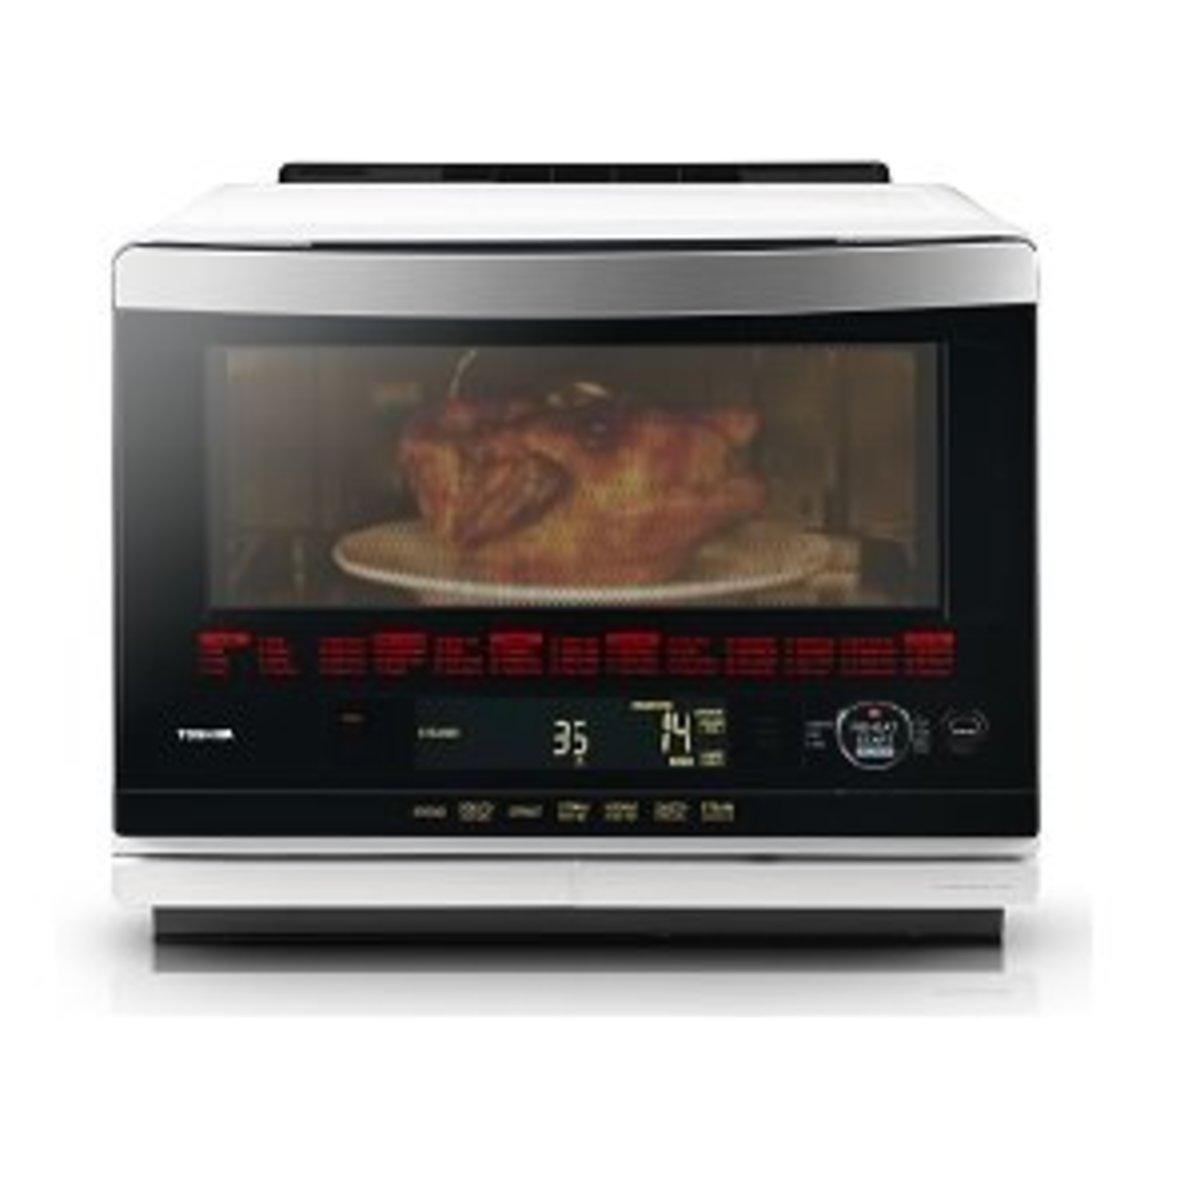 ERLD430HK 純蒸氣烤焗水波爐(31公升)